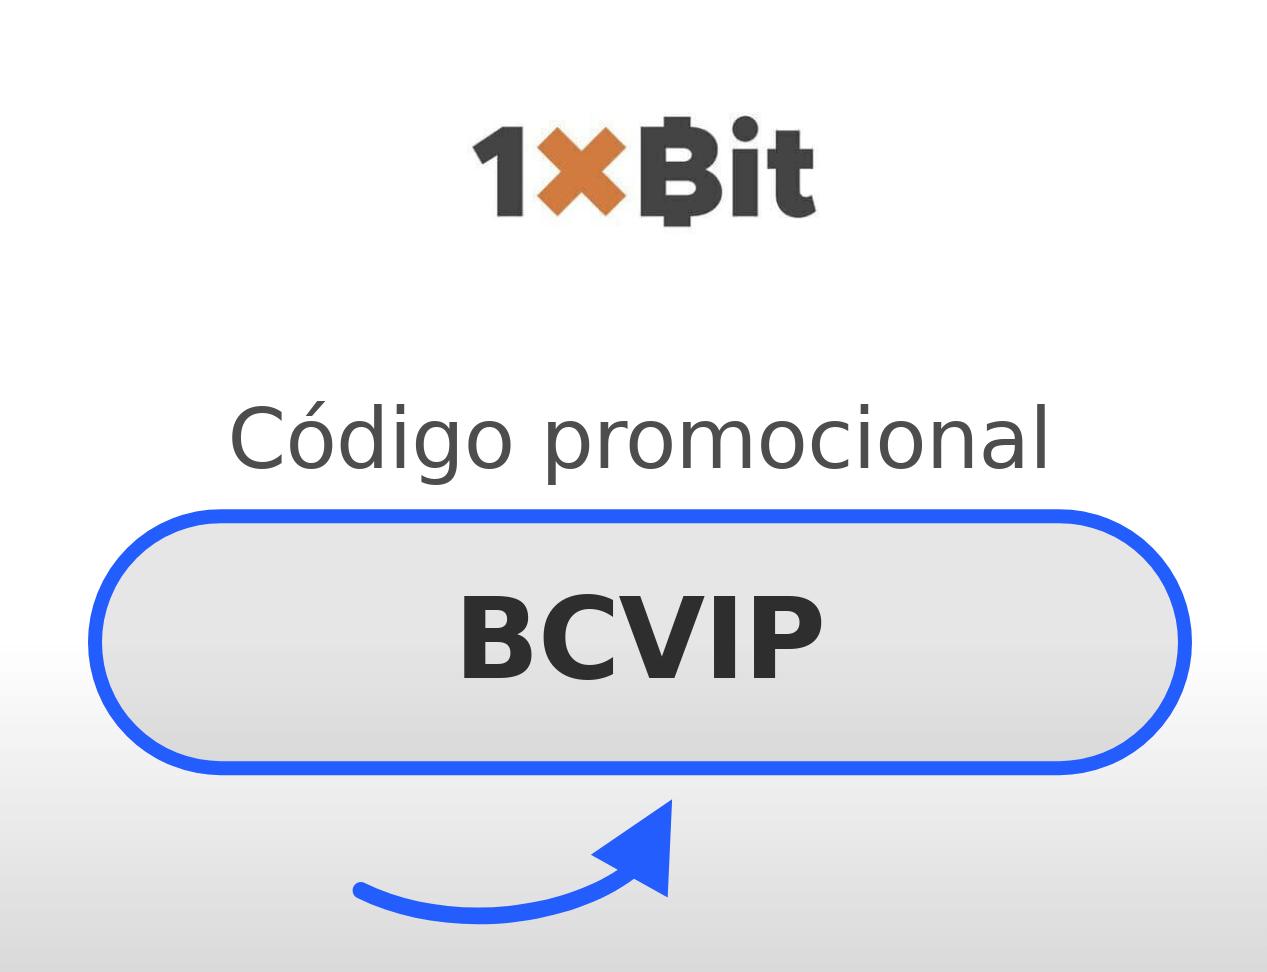 Código Promocional 1xBit